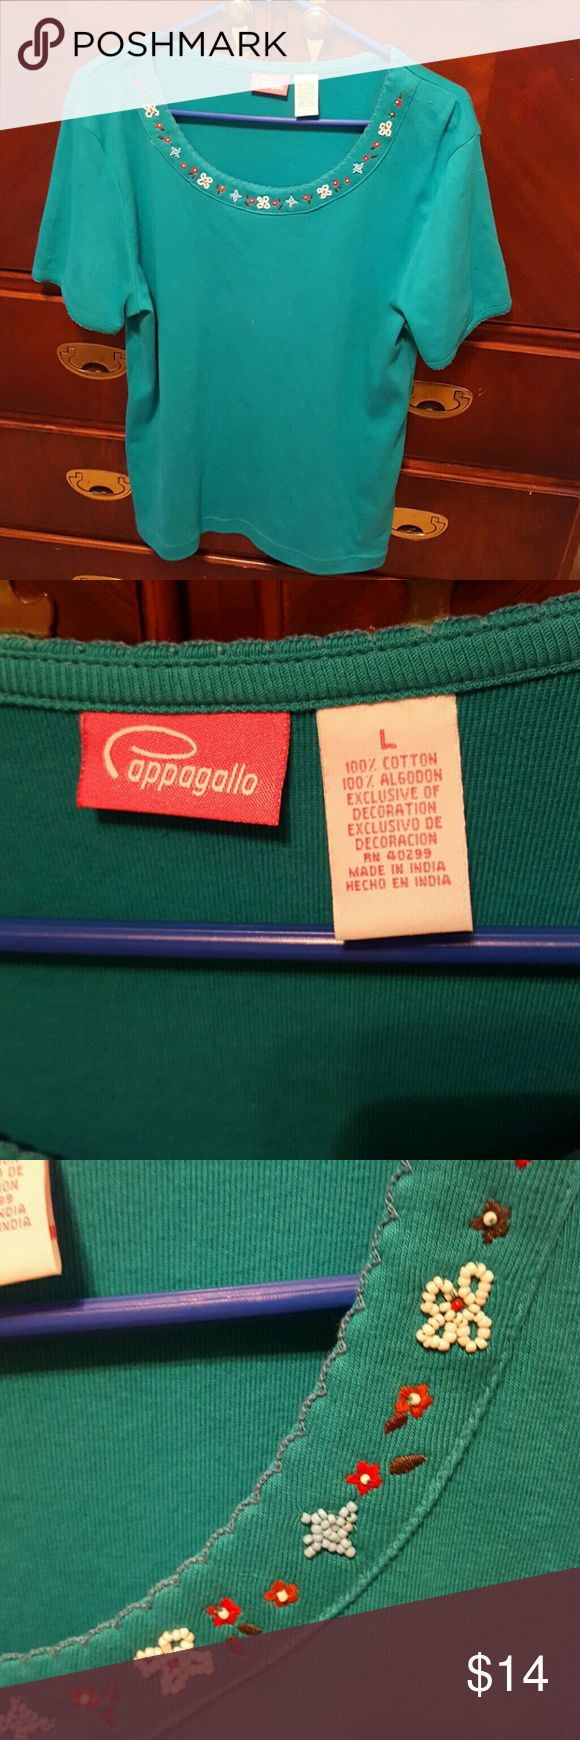 Cappagallo short sleeve turquoise shirt Cute Beading details at collar Cappagallo Tops Blouses